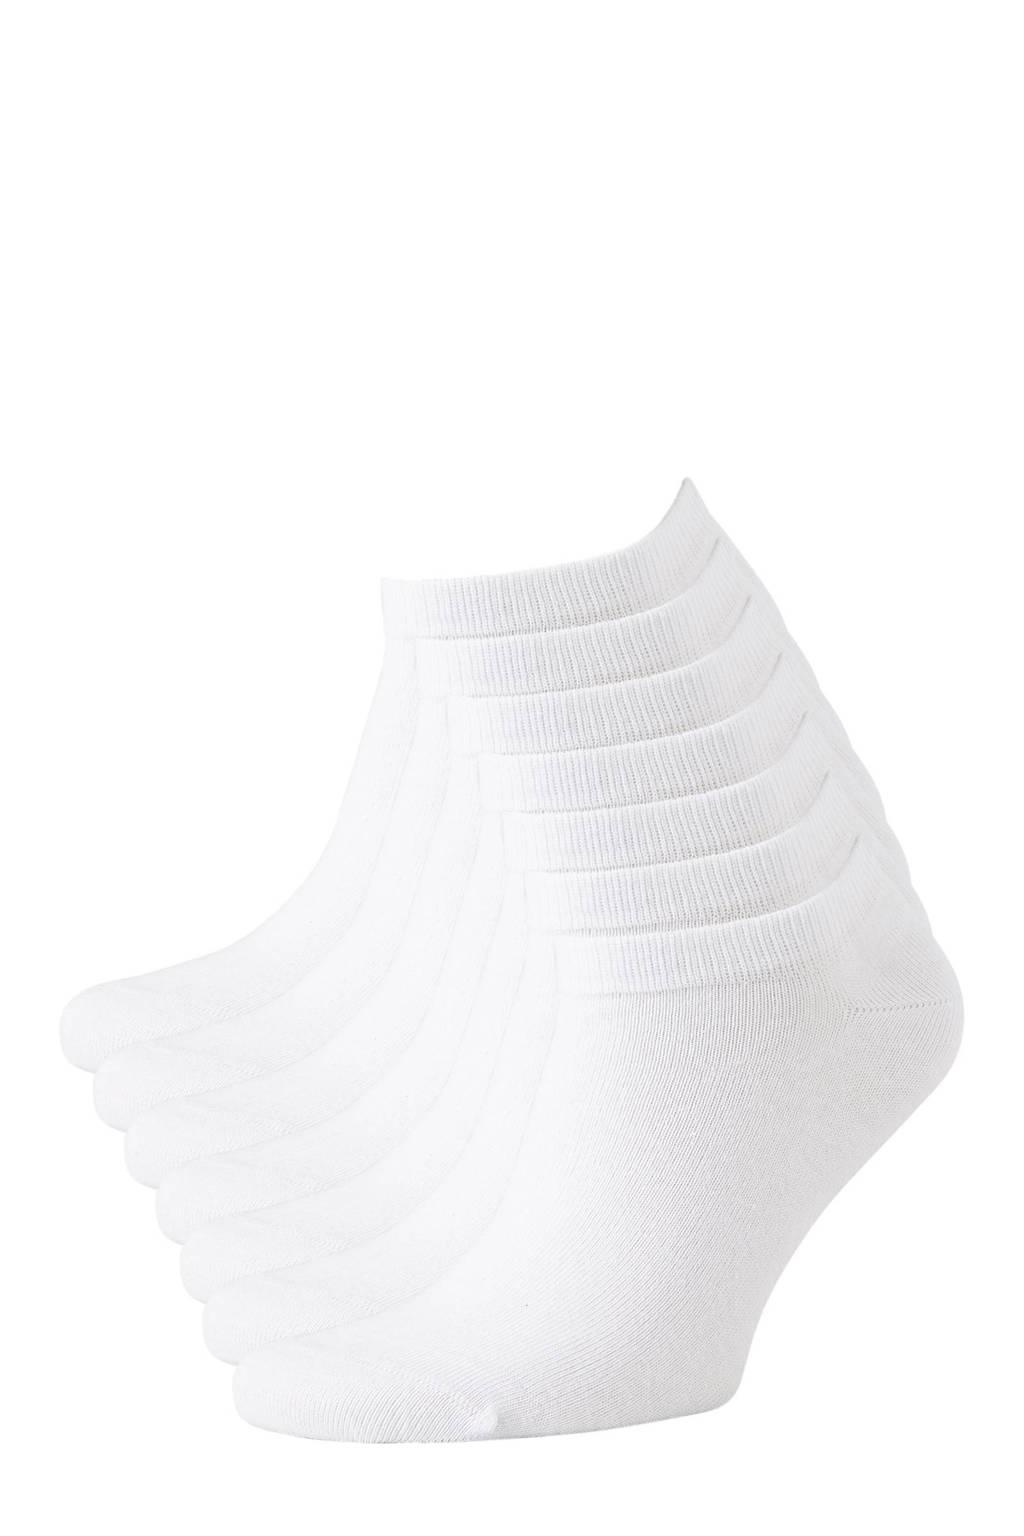 whkmp's own sneakersokken (7 paar), Wit